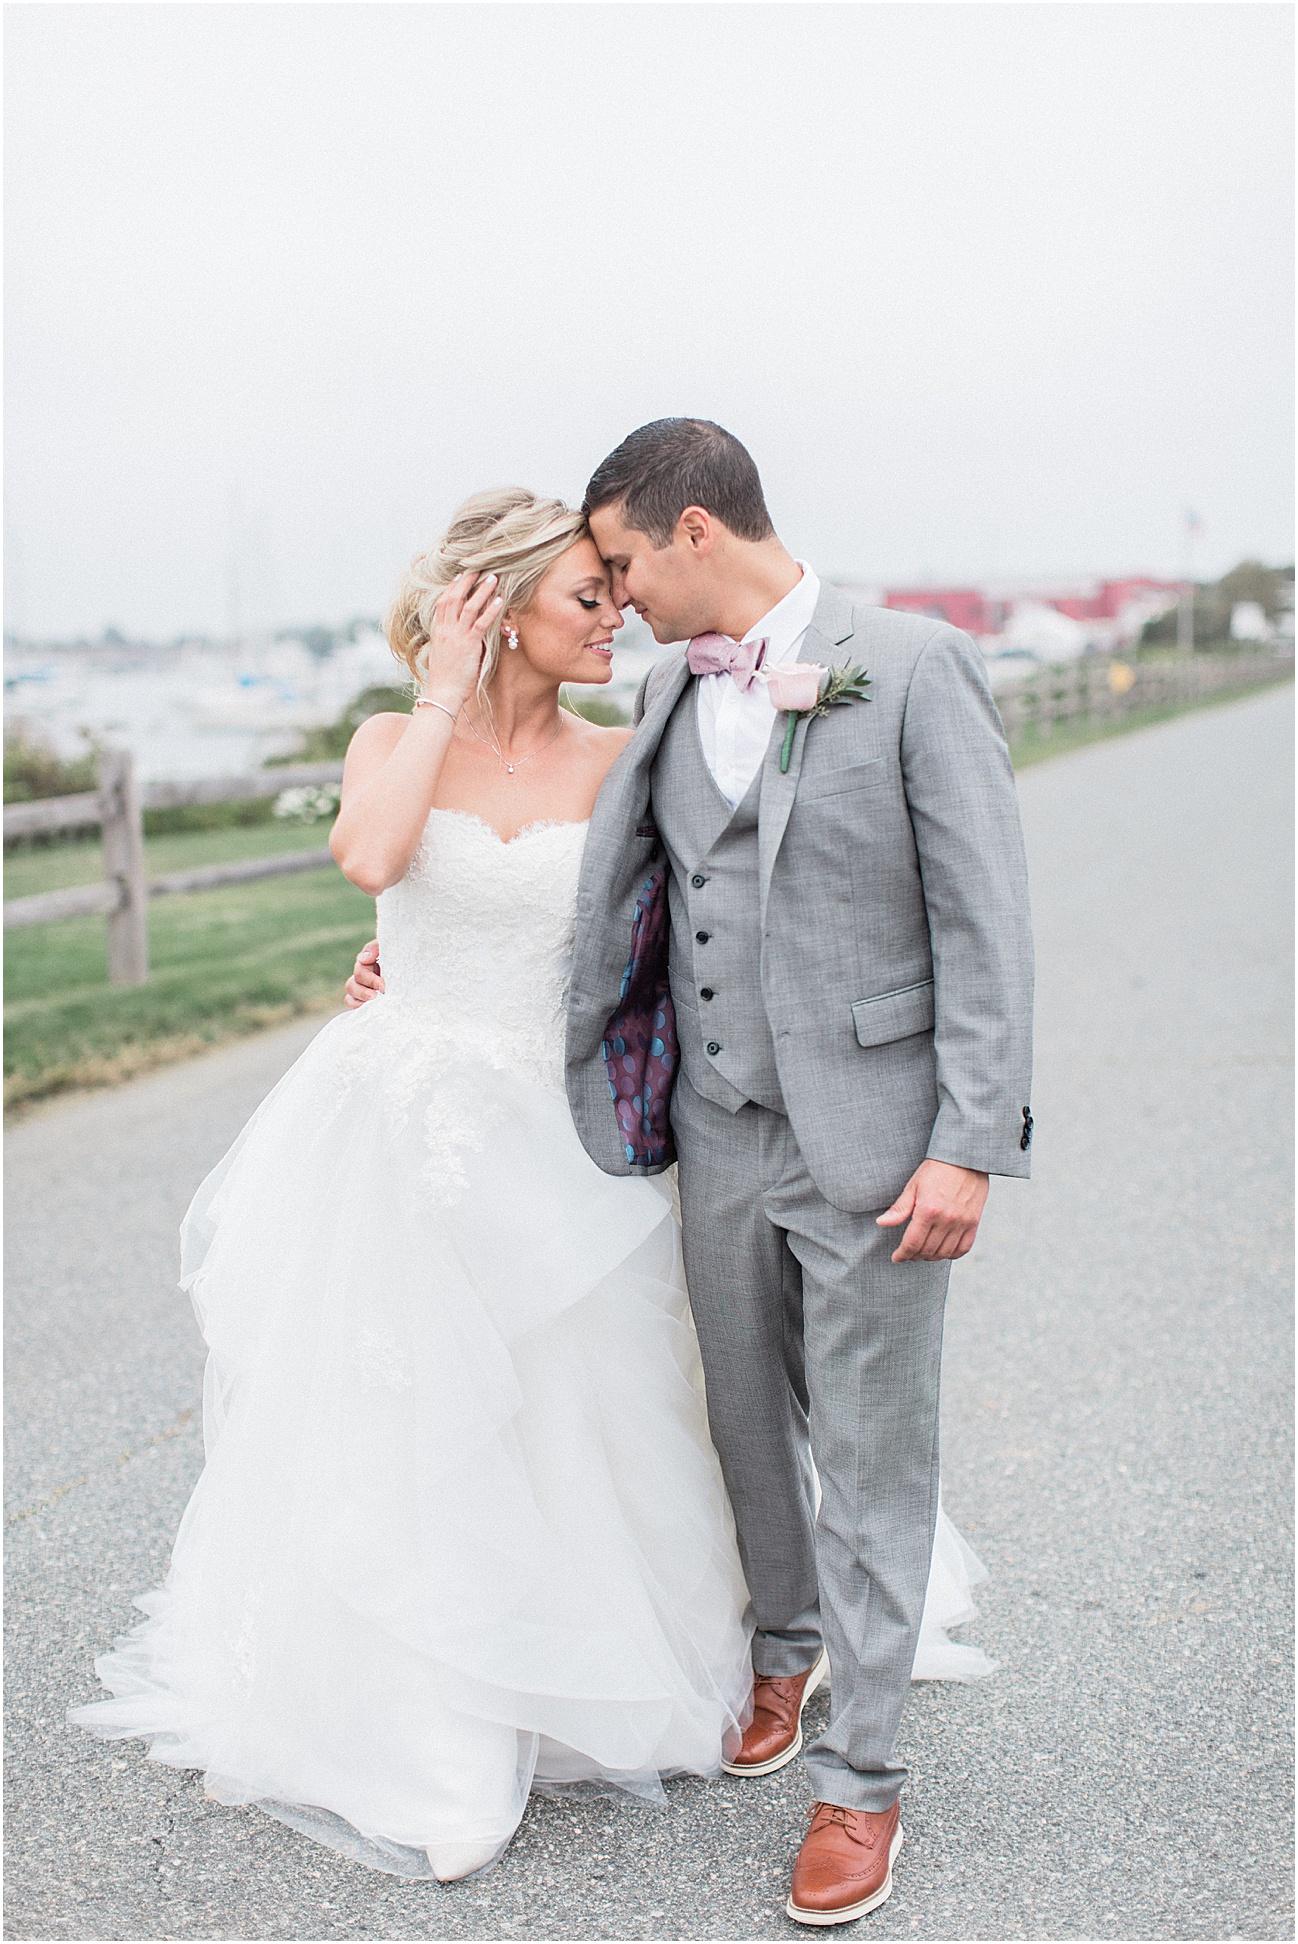 deanna_tyler_popponesset_inn_nautical_dusty_rose_pink_blue_french_fall_gray_bridesmaid_cape_cod_boston_wedding_photographer_meredith_jane_photography_photo_1357.jpg